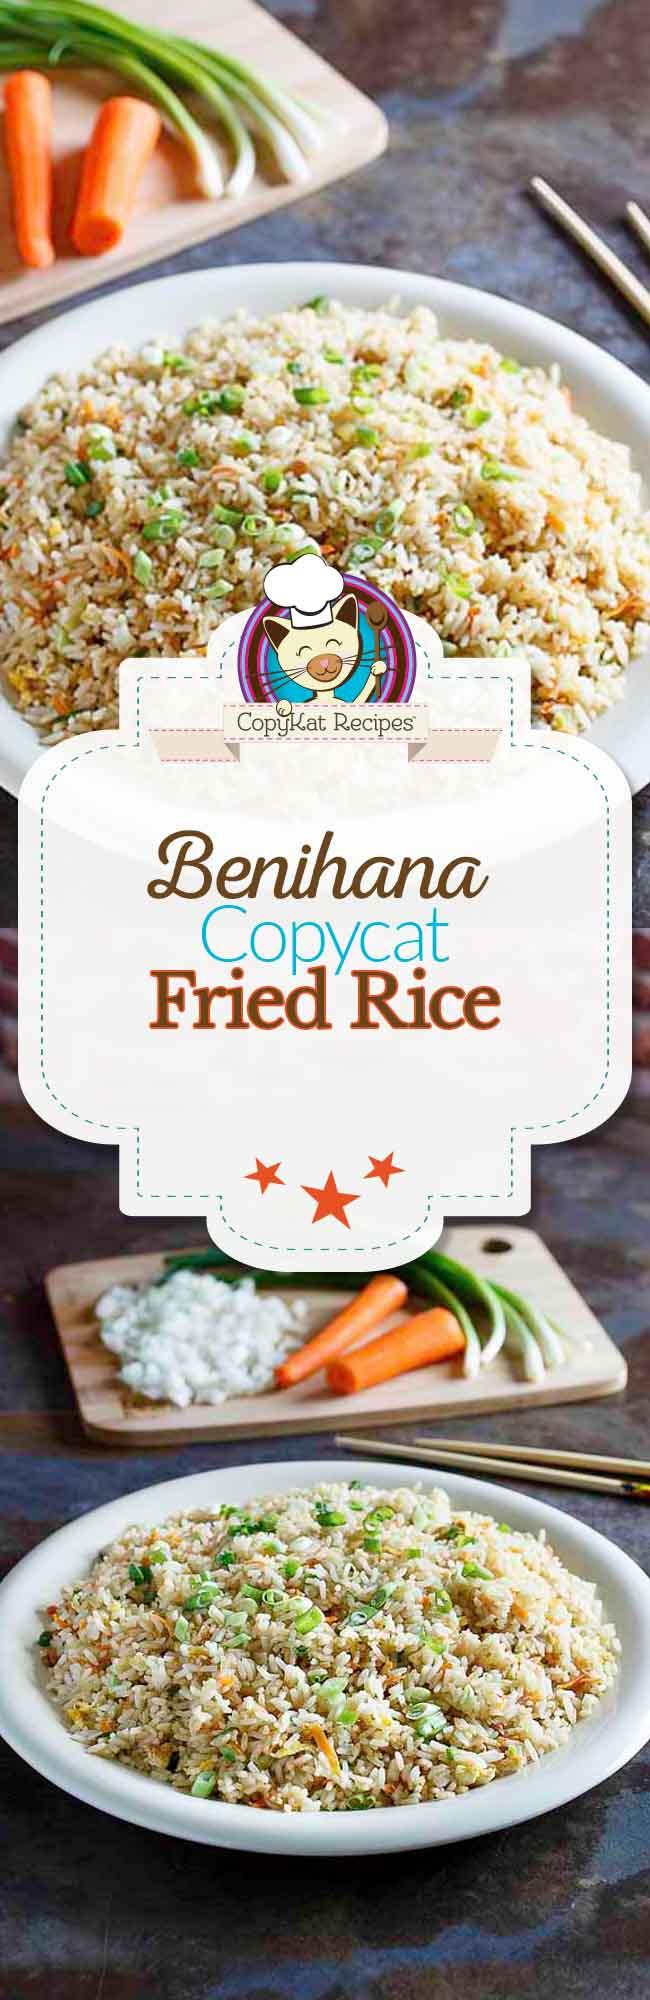 Benihana Fried Rice Recipe Copykat recipes, Recipes